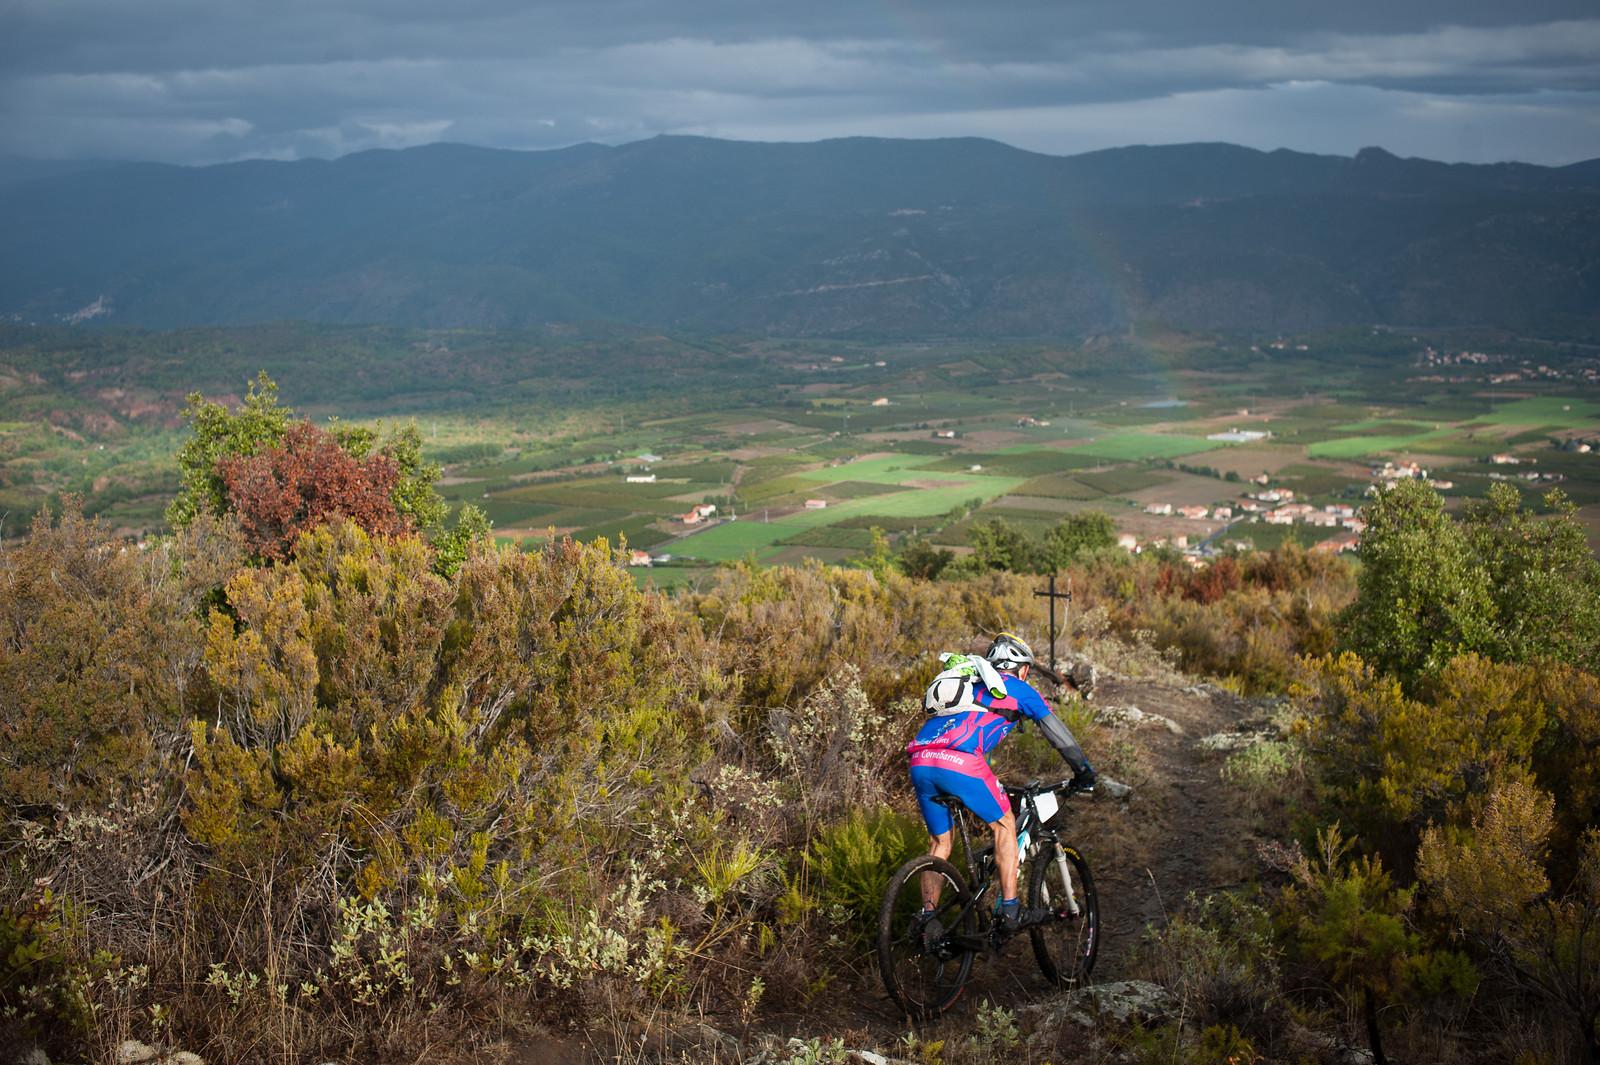 Pyrénées (south France) - Yann_Kerveno - Mountain Biking Pictures - Vital MTB